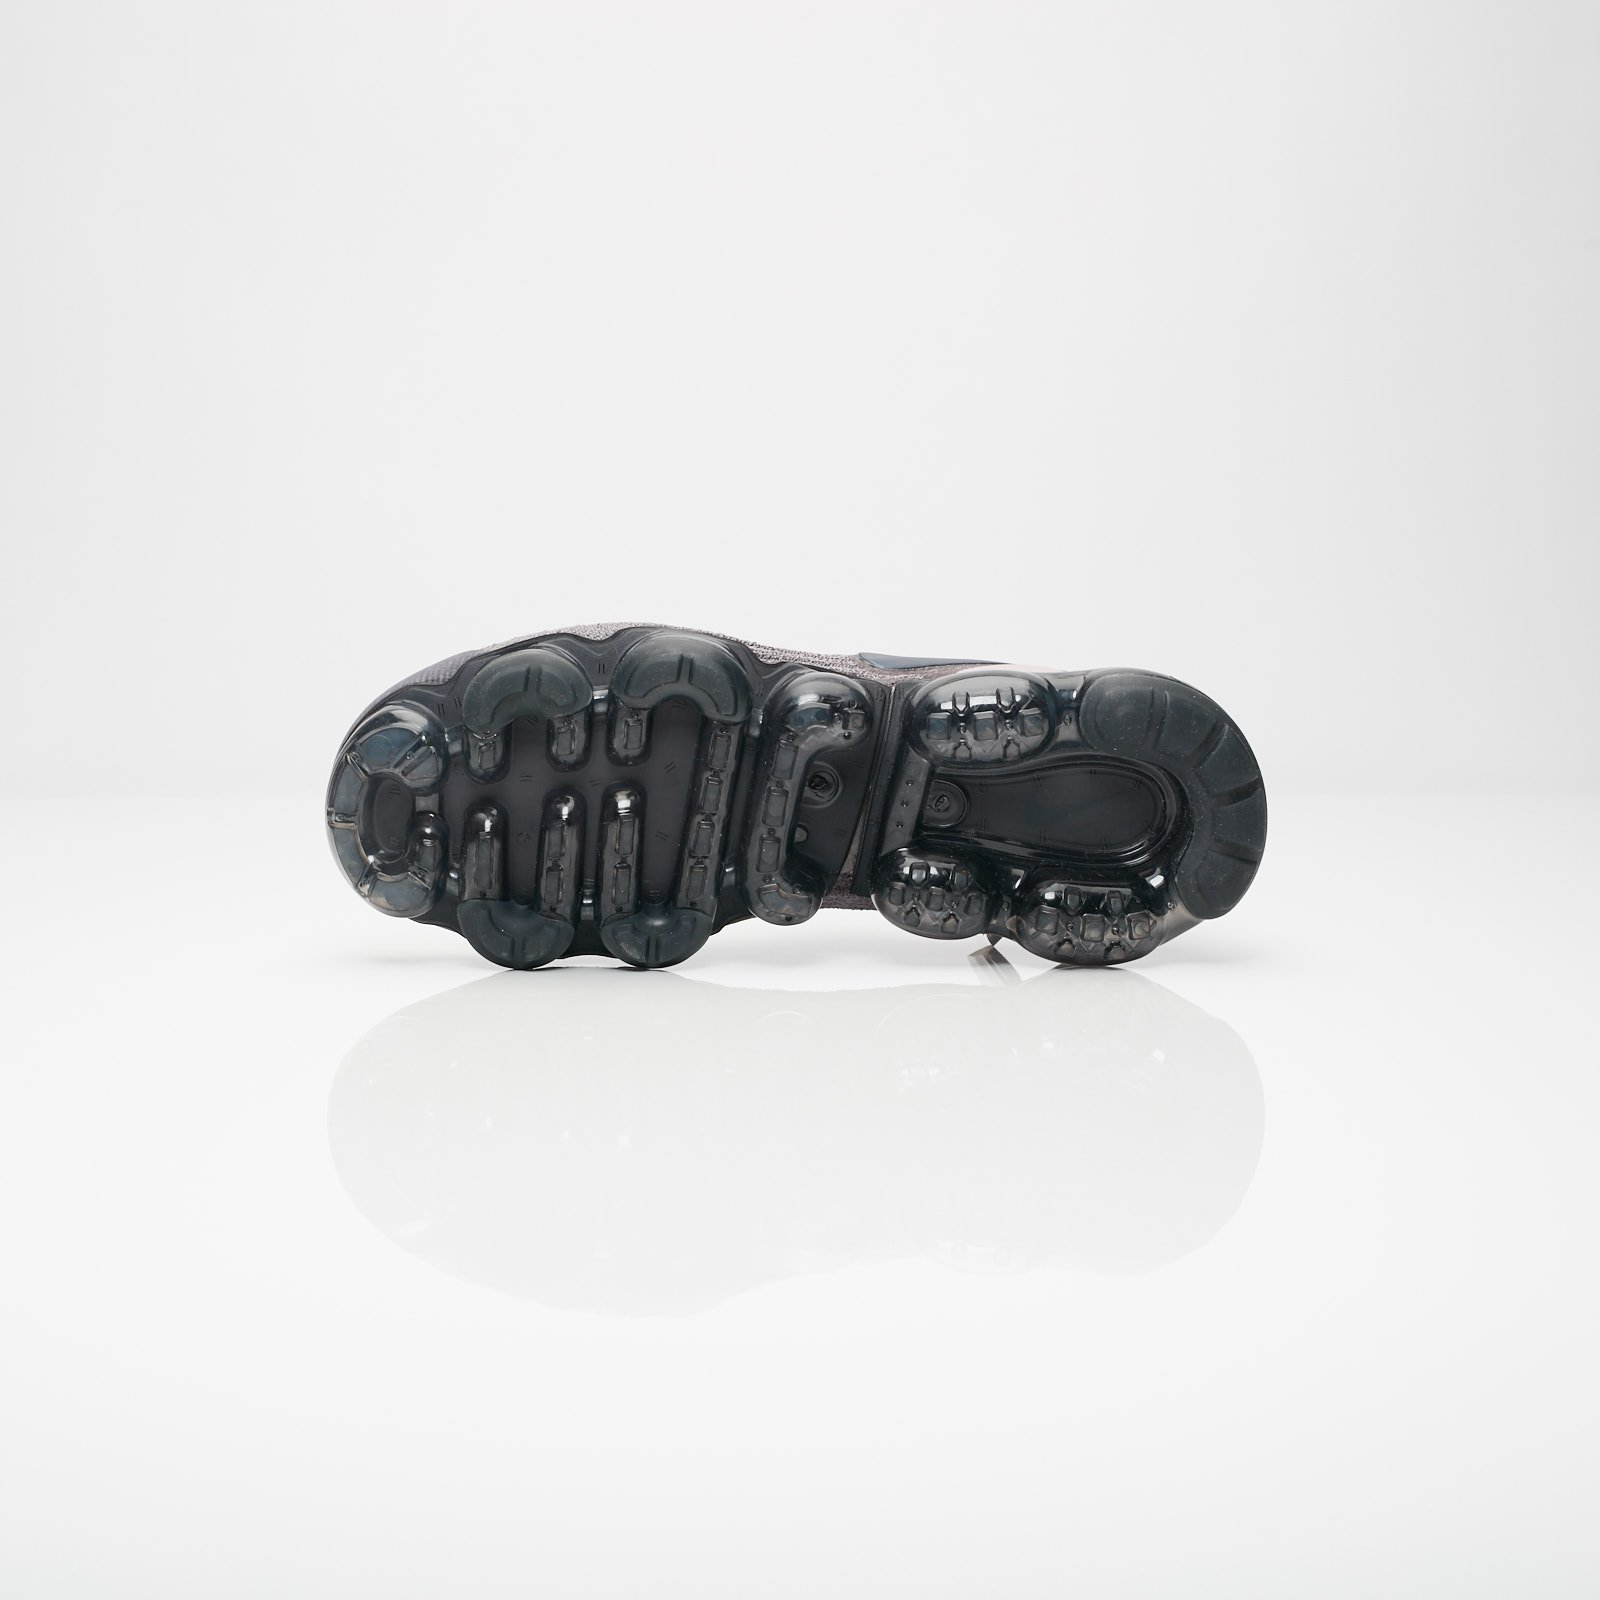 7739c004c6 Nike Wmns Air Vapormax FK Moc 2 - Aj6599-003 - Sneakersnstuff ...